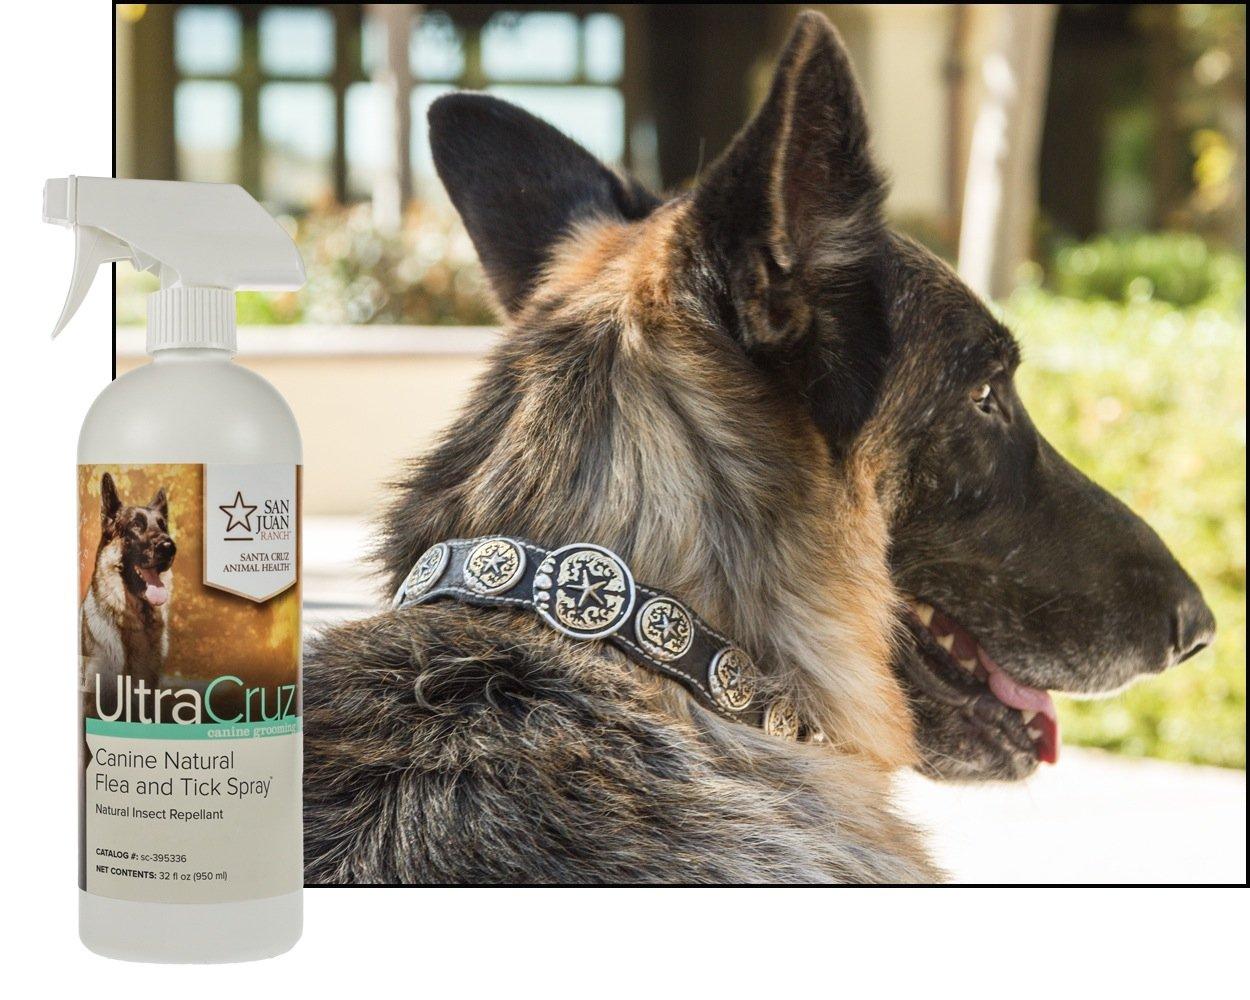 UltraCruz Canine Natural Flea and Tick Spray for Horses, 32 oz. by UltraCruz (Image #2)